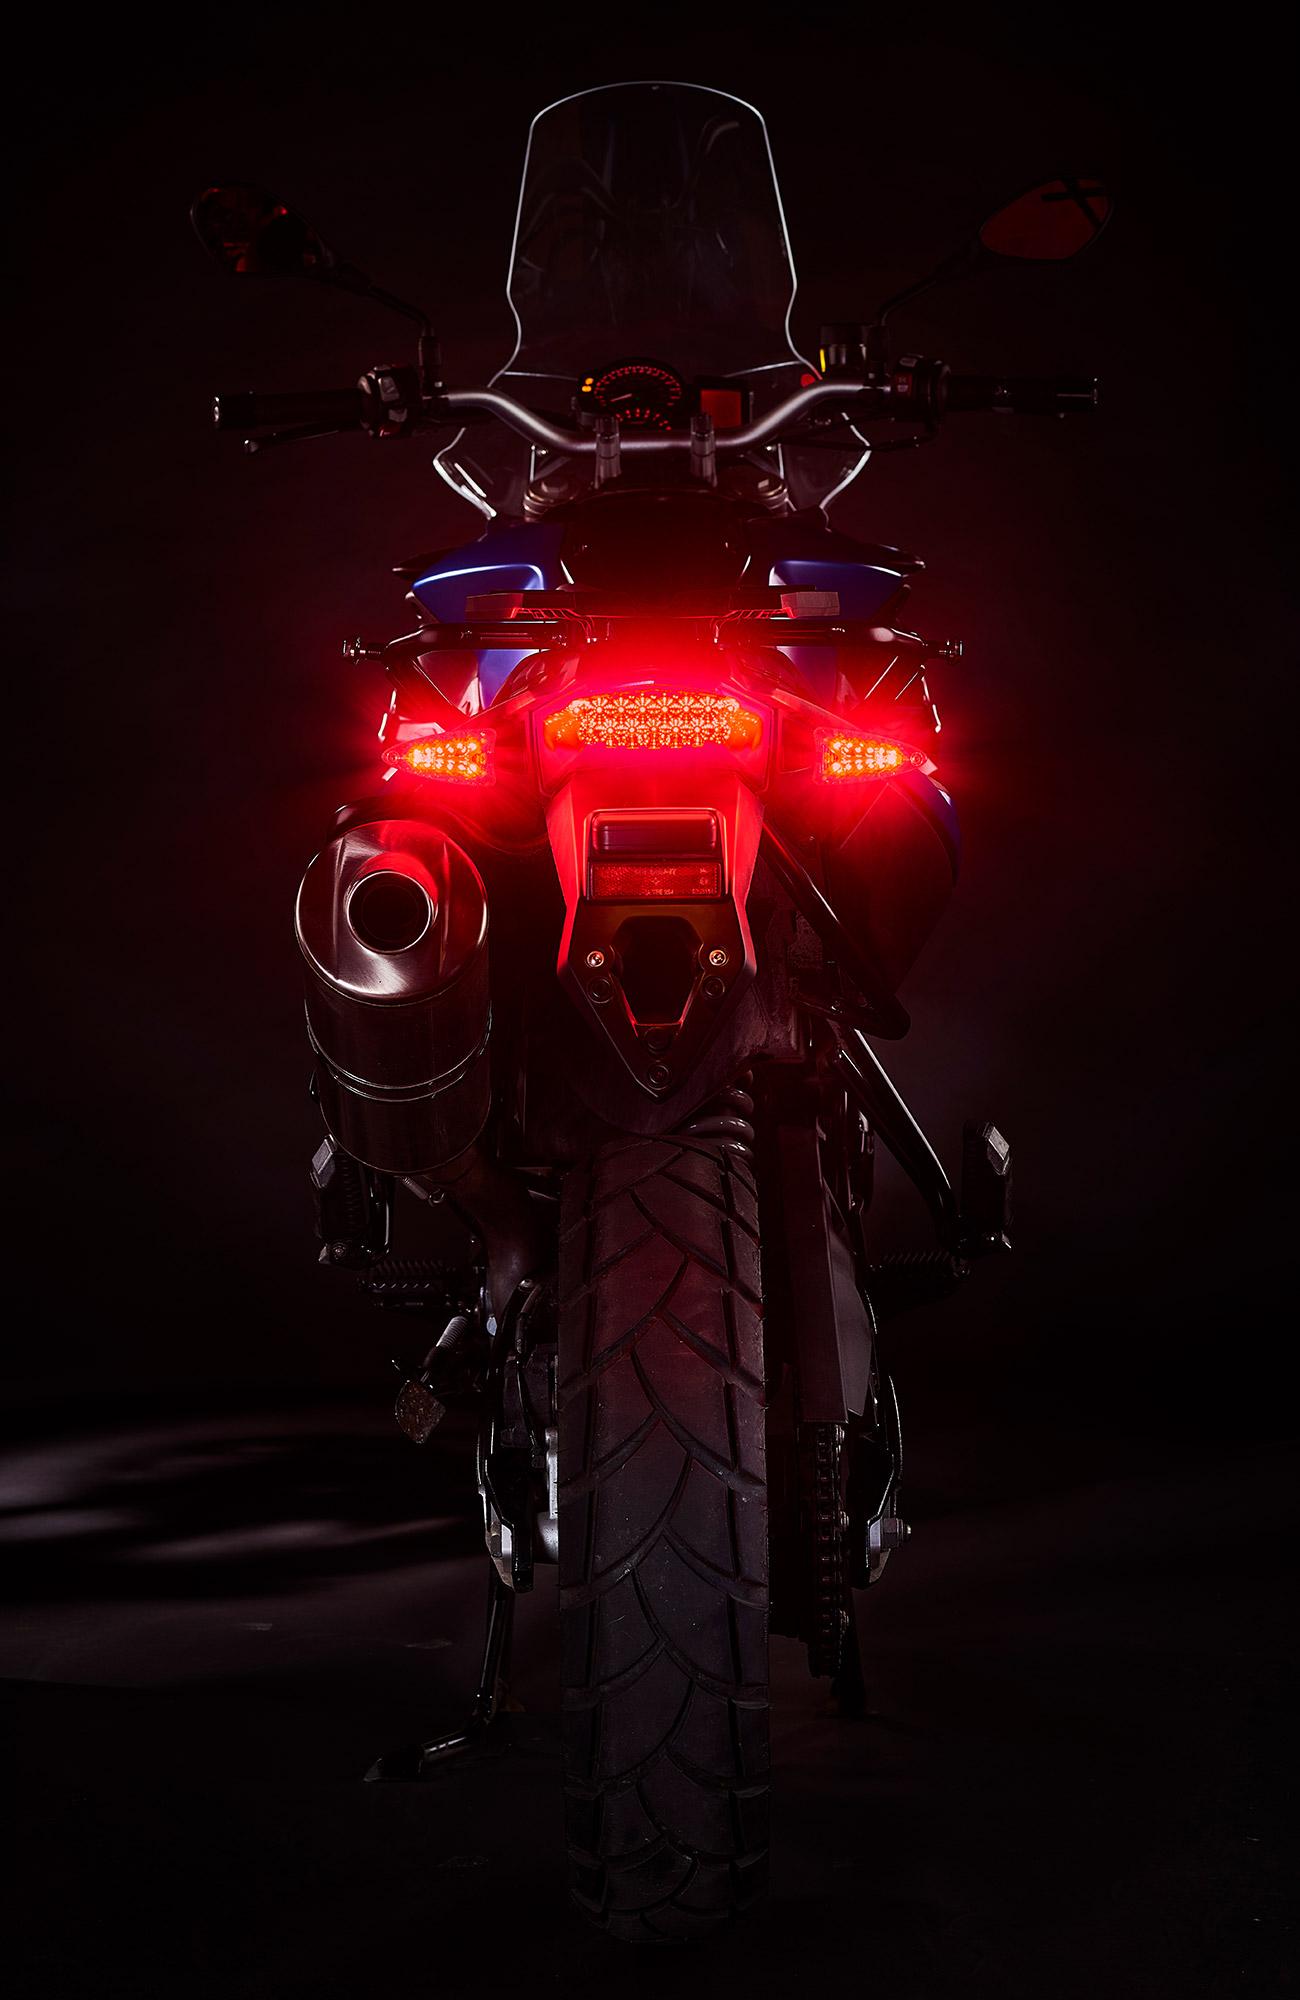 2-in-1-ultrabrights-brake-turn-newBMWs-1 (web).jpg